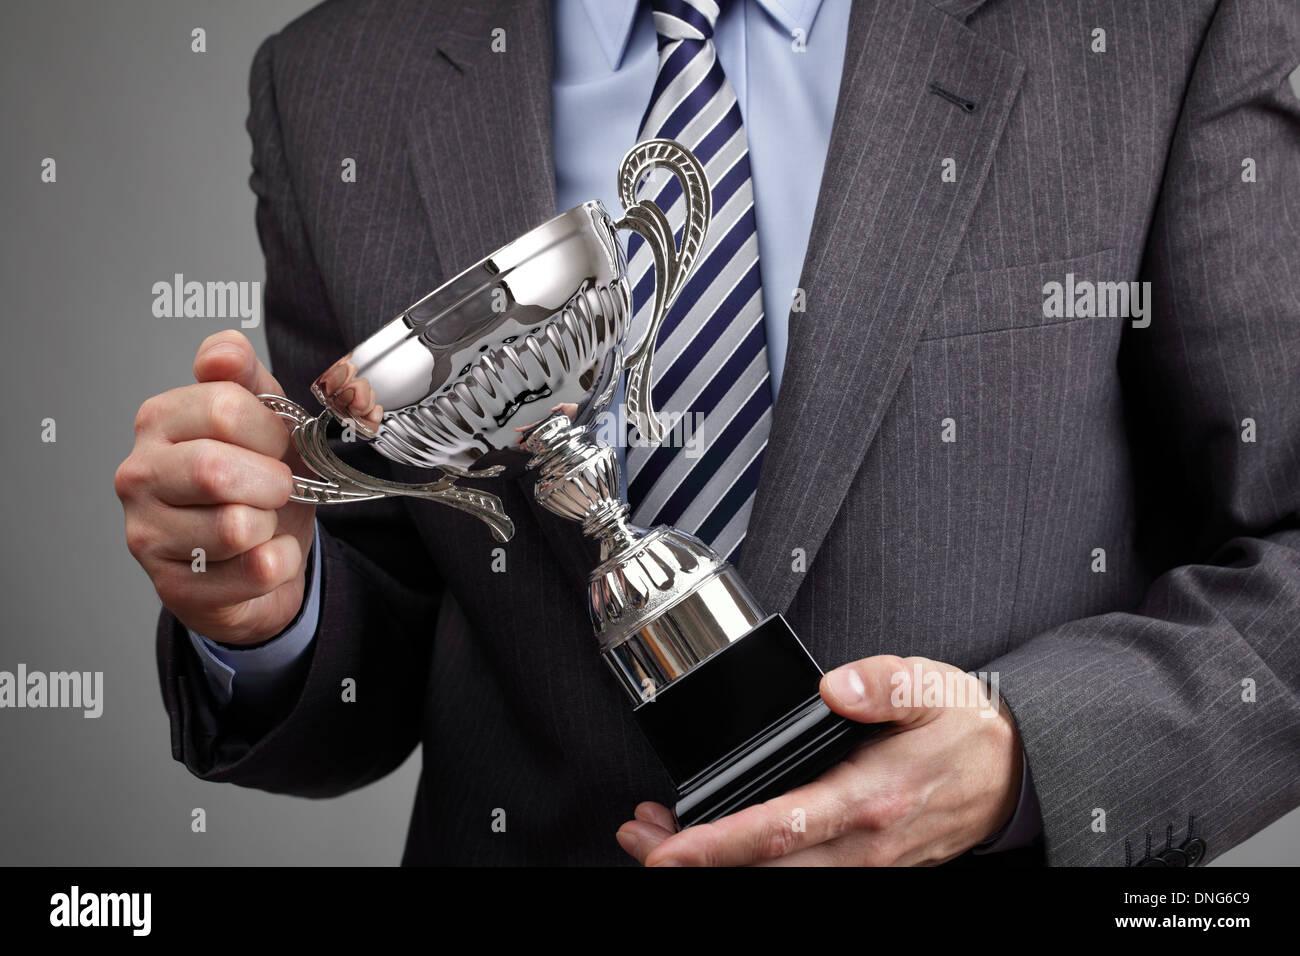 Empresa ganadora trofeo Imagen De Stock